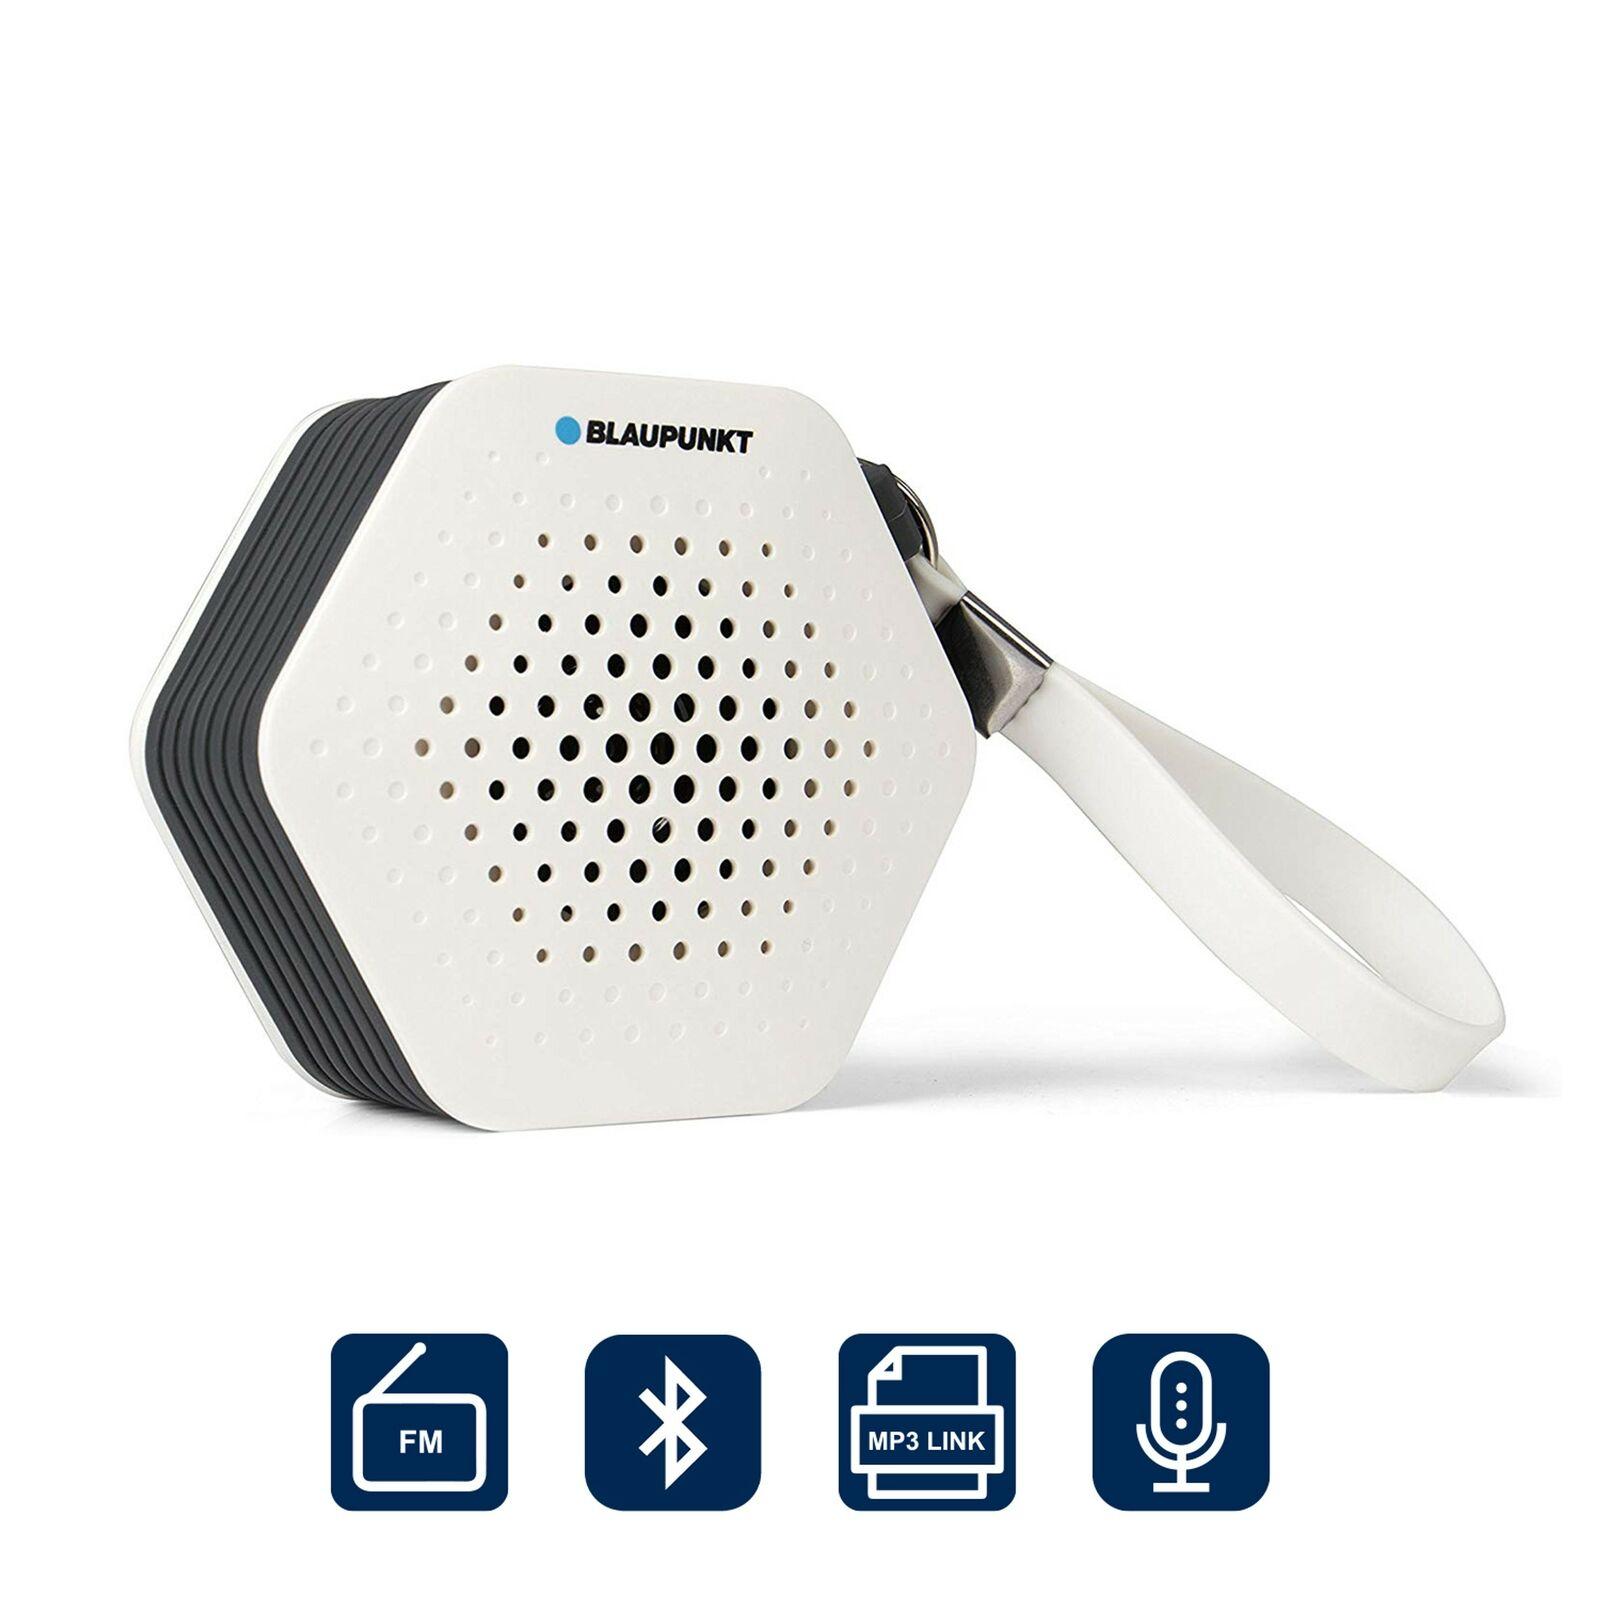 BLAUPUNKT Badradio SRB 10 UKW FM Duschradio Badezimmer Camping Radio Bluetooth